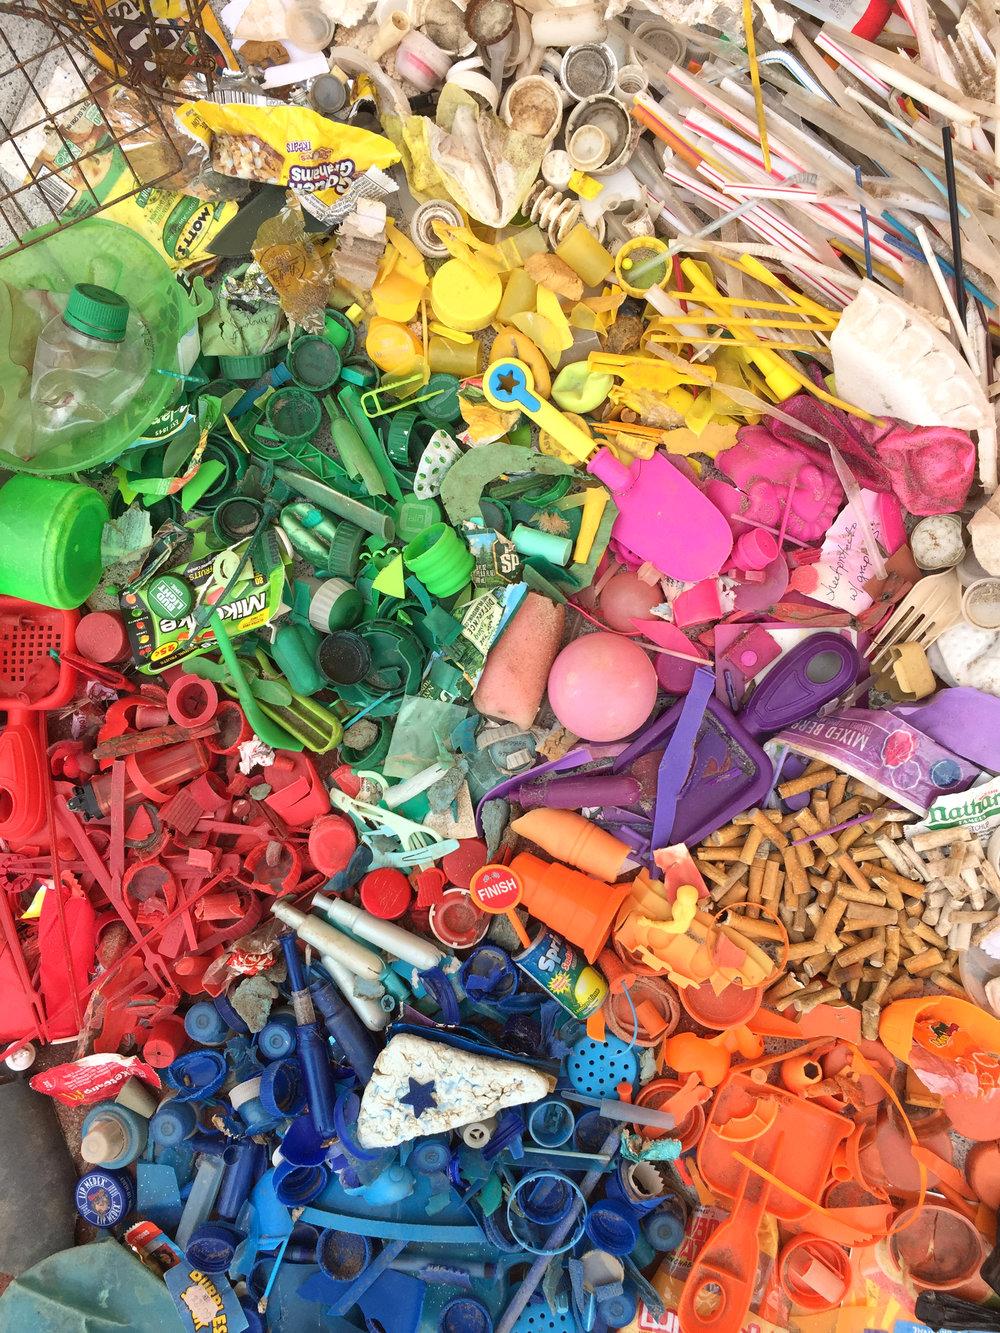 amy_chen_design_beach_clean_coney_island_rainbow_litter.JPG